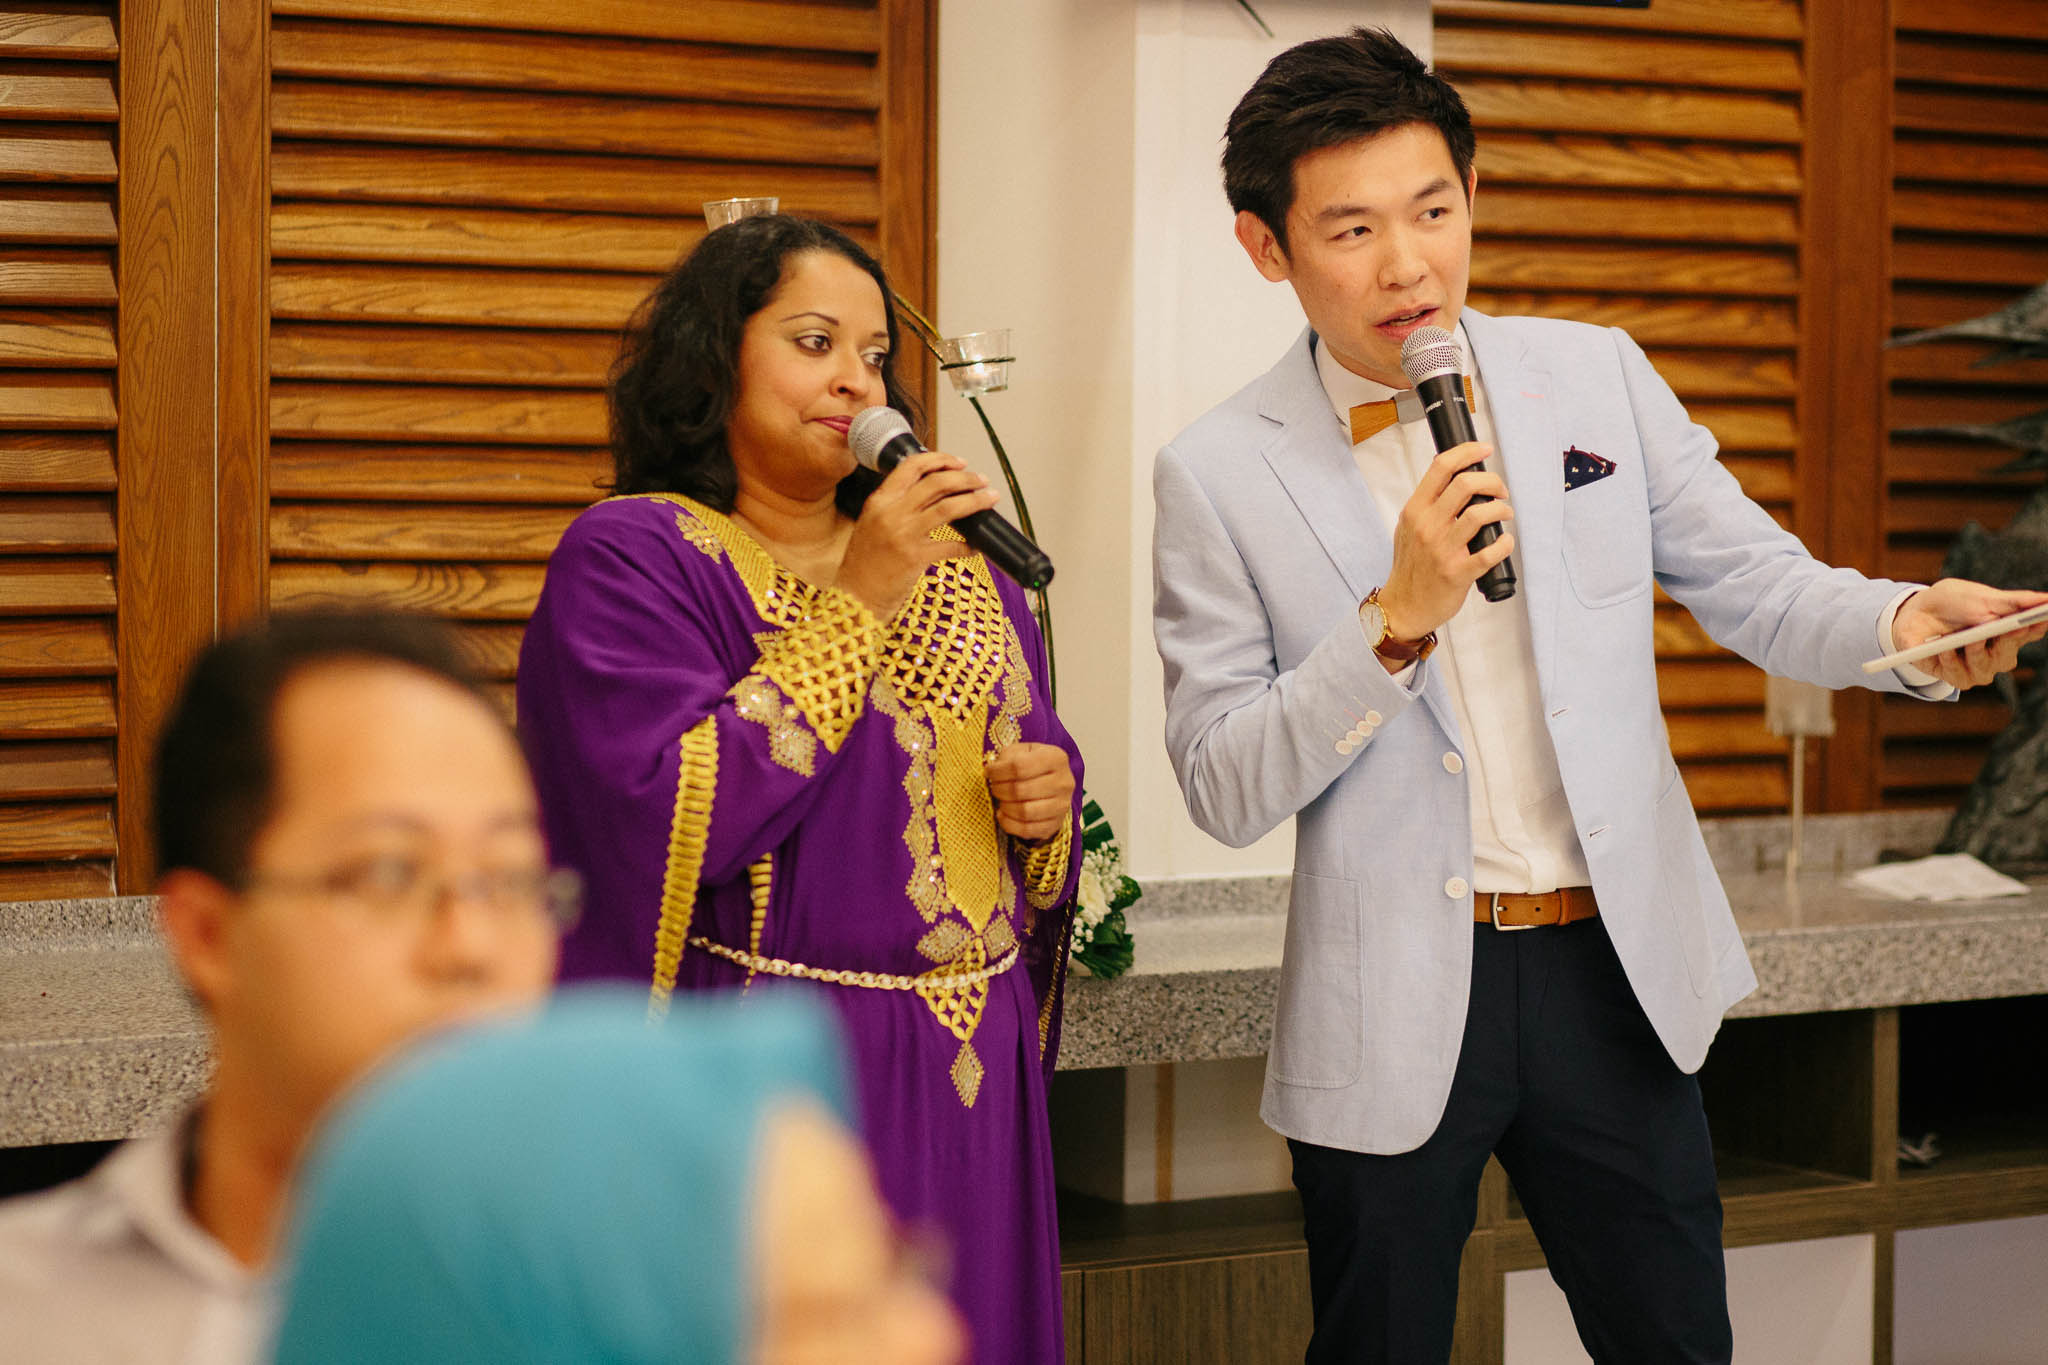 singapore-wedding-photographer-malay-indian-pre-wedding-travel-wmt-2015-shereen-farid-56.jpg